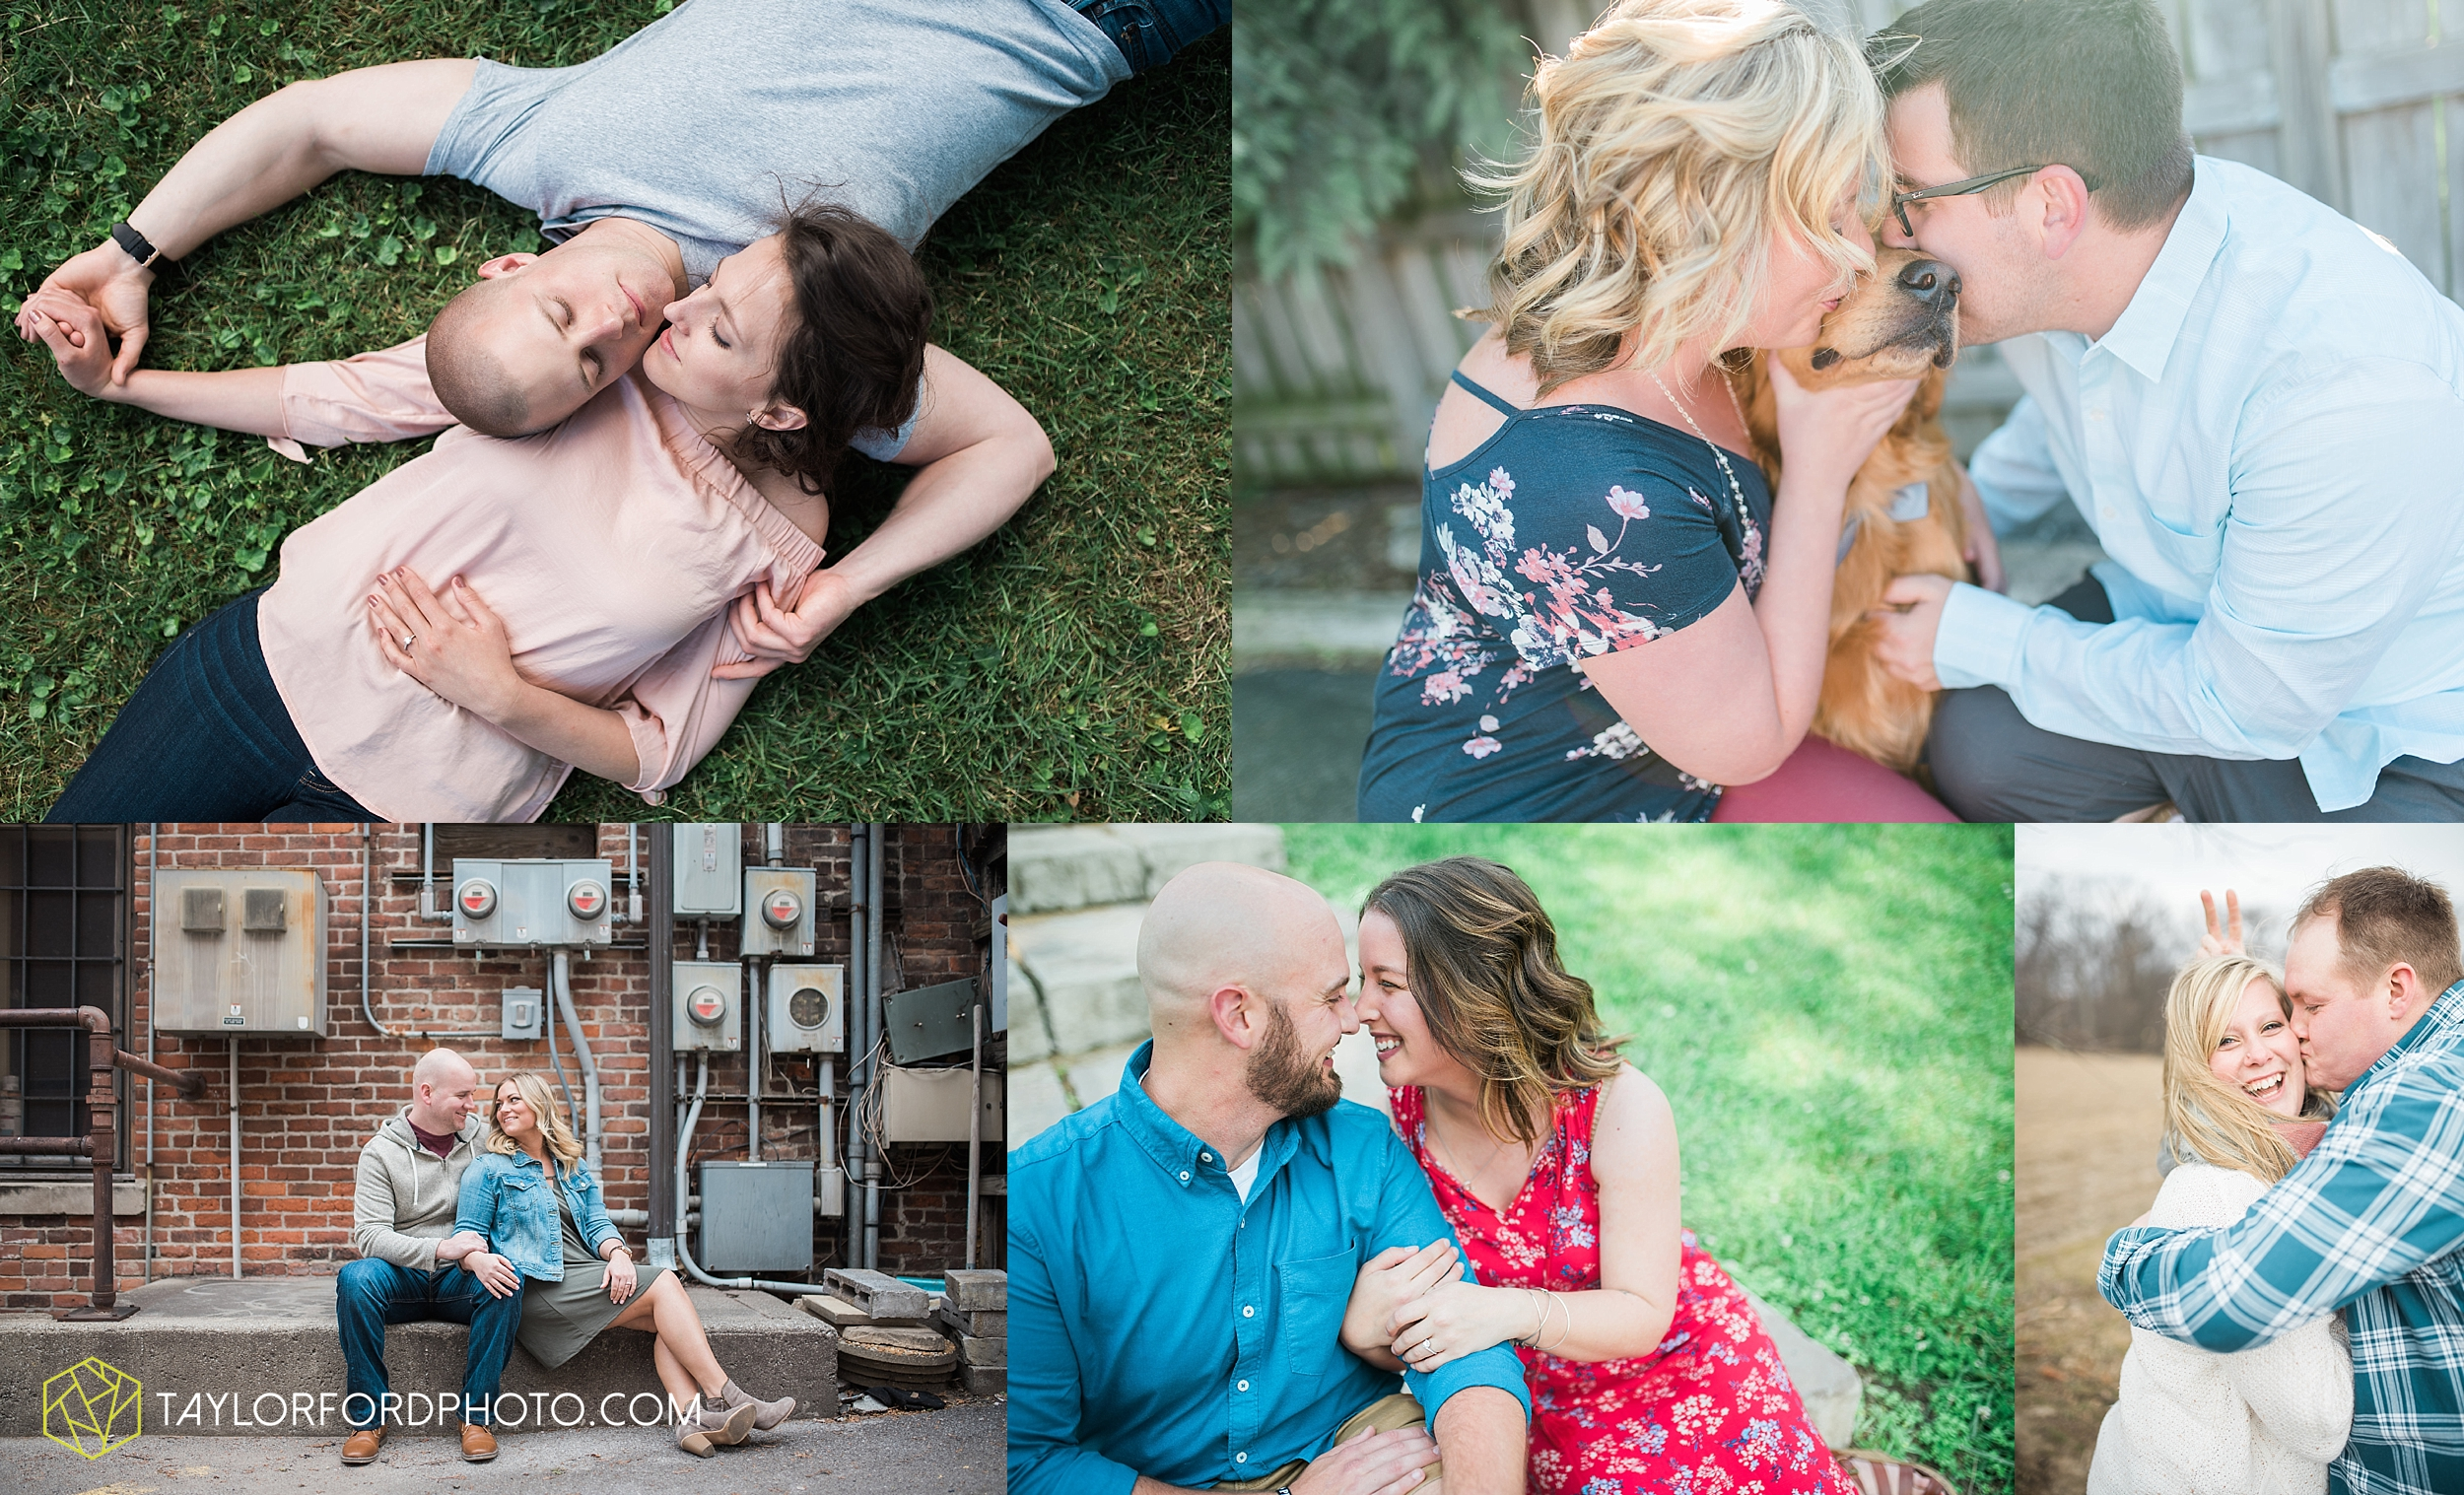 van-wert-ohio-fort-wayne-indiana-photographer-Taylor-Ford-Photography-wedding-engagement-family-senior_4414.jpg